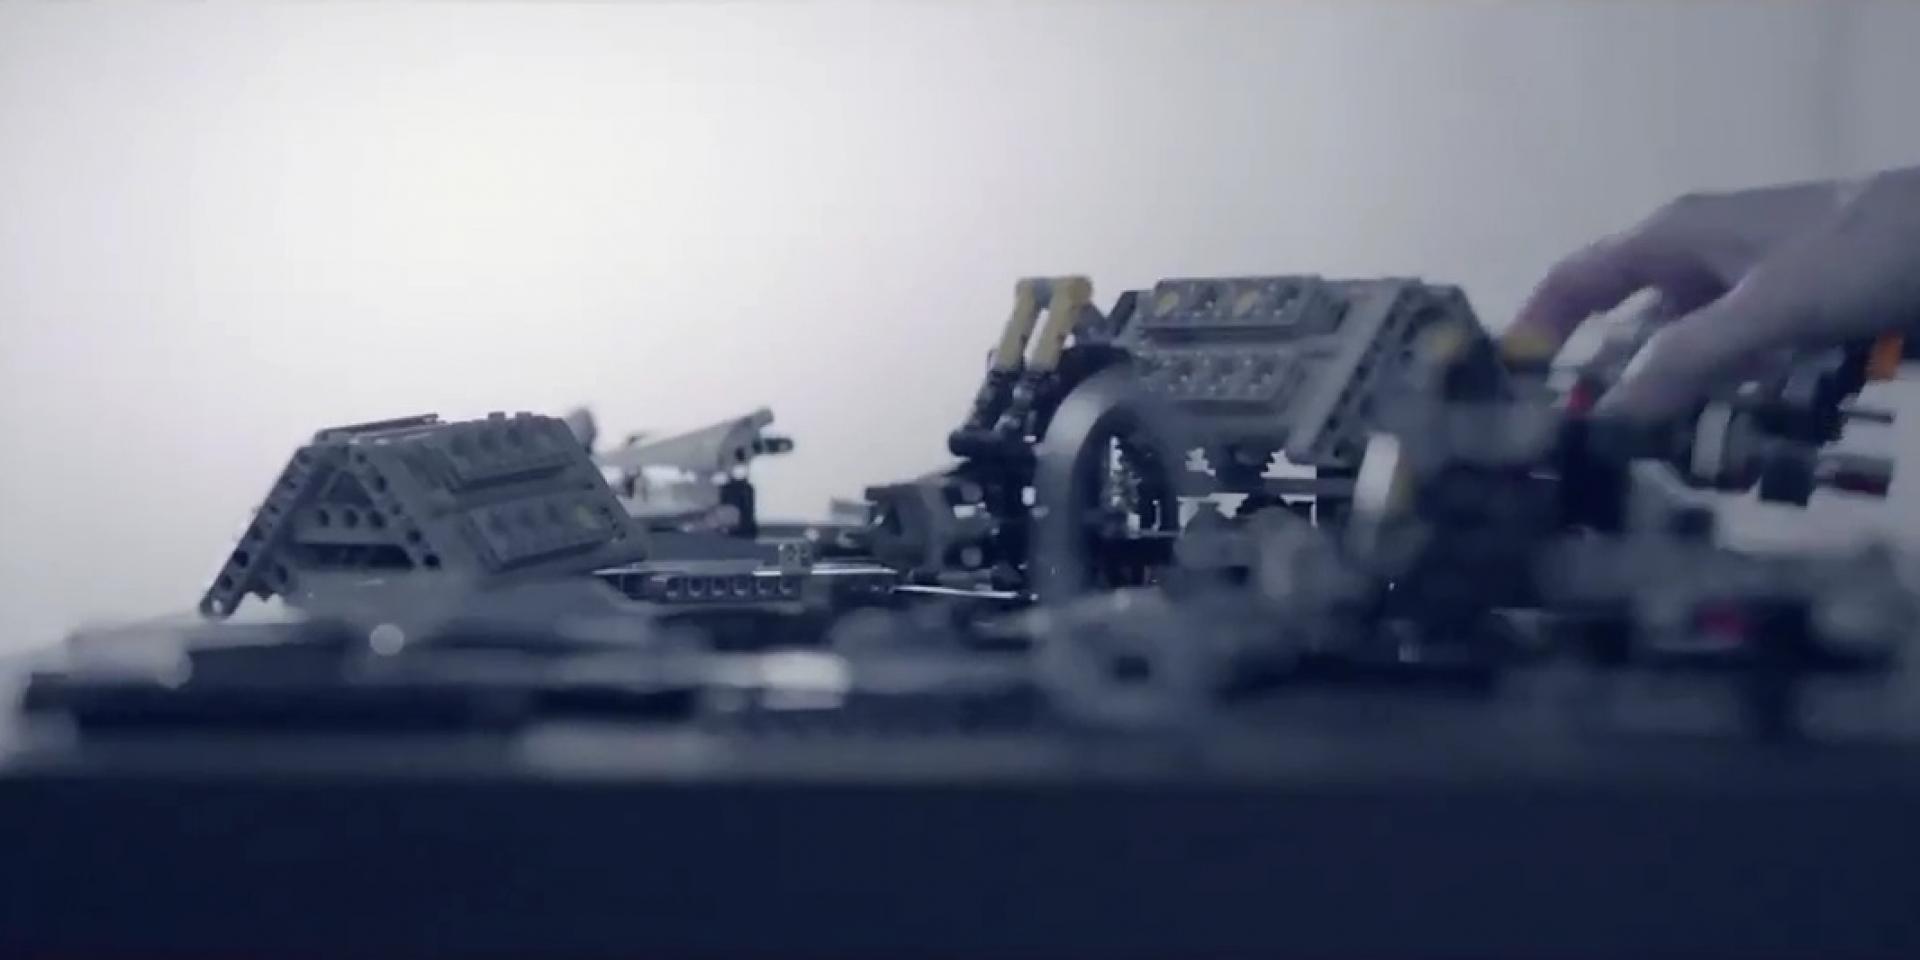 真的Bugatti Chiron買不起,Lego Technic Bugatti Chiron滿足你小小願望